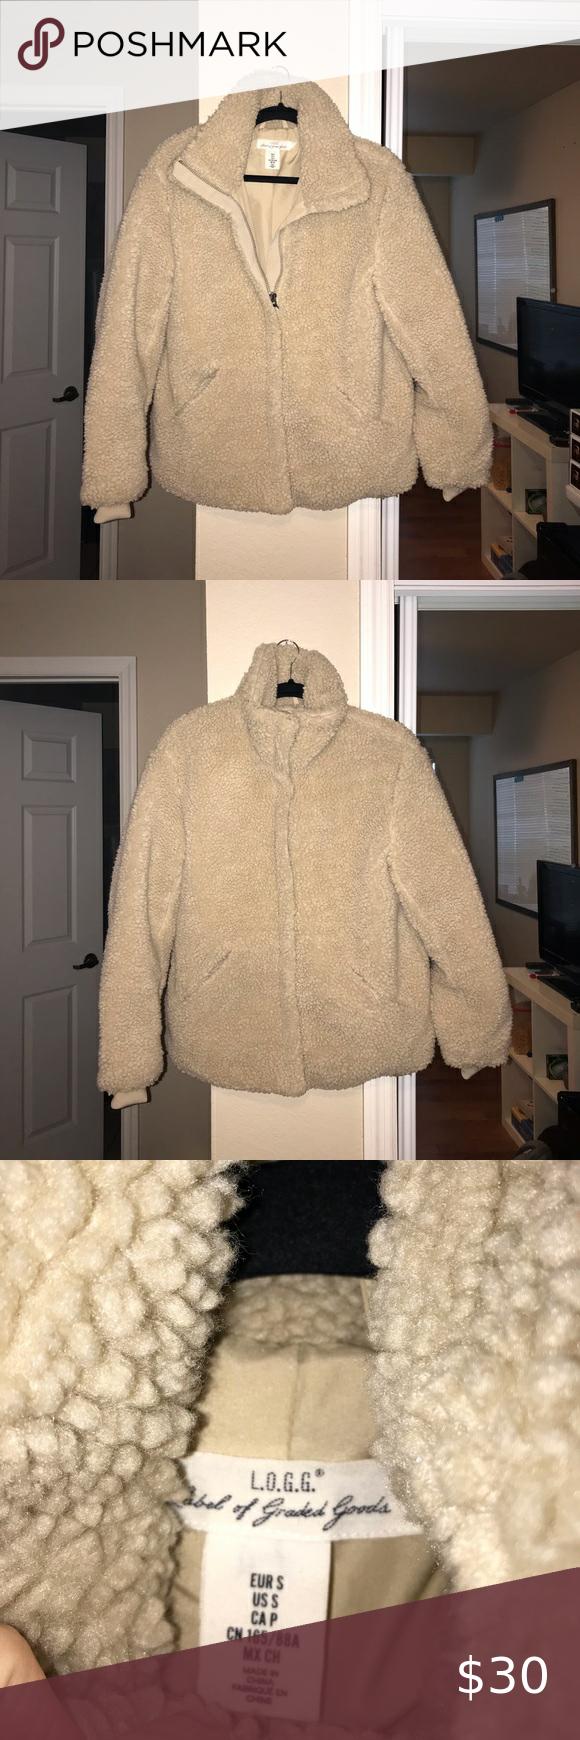 Faux Shearling jacket Jacket H&M Jackets & Coats #myposhpicks